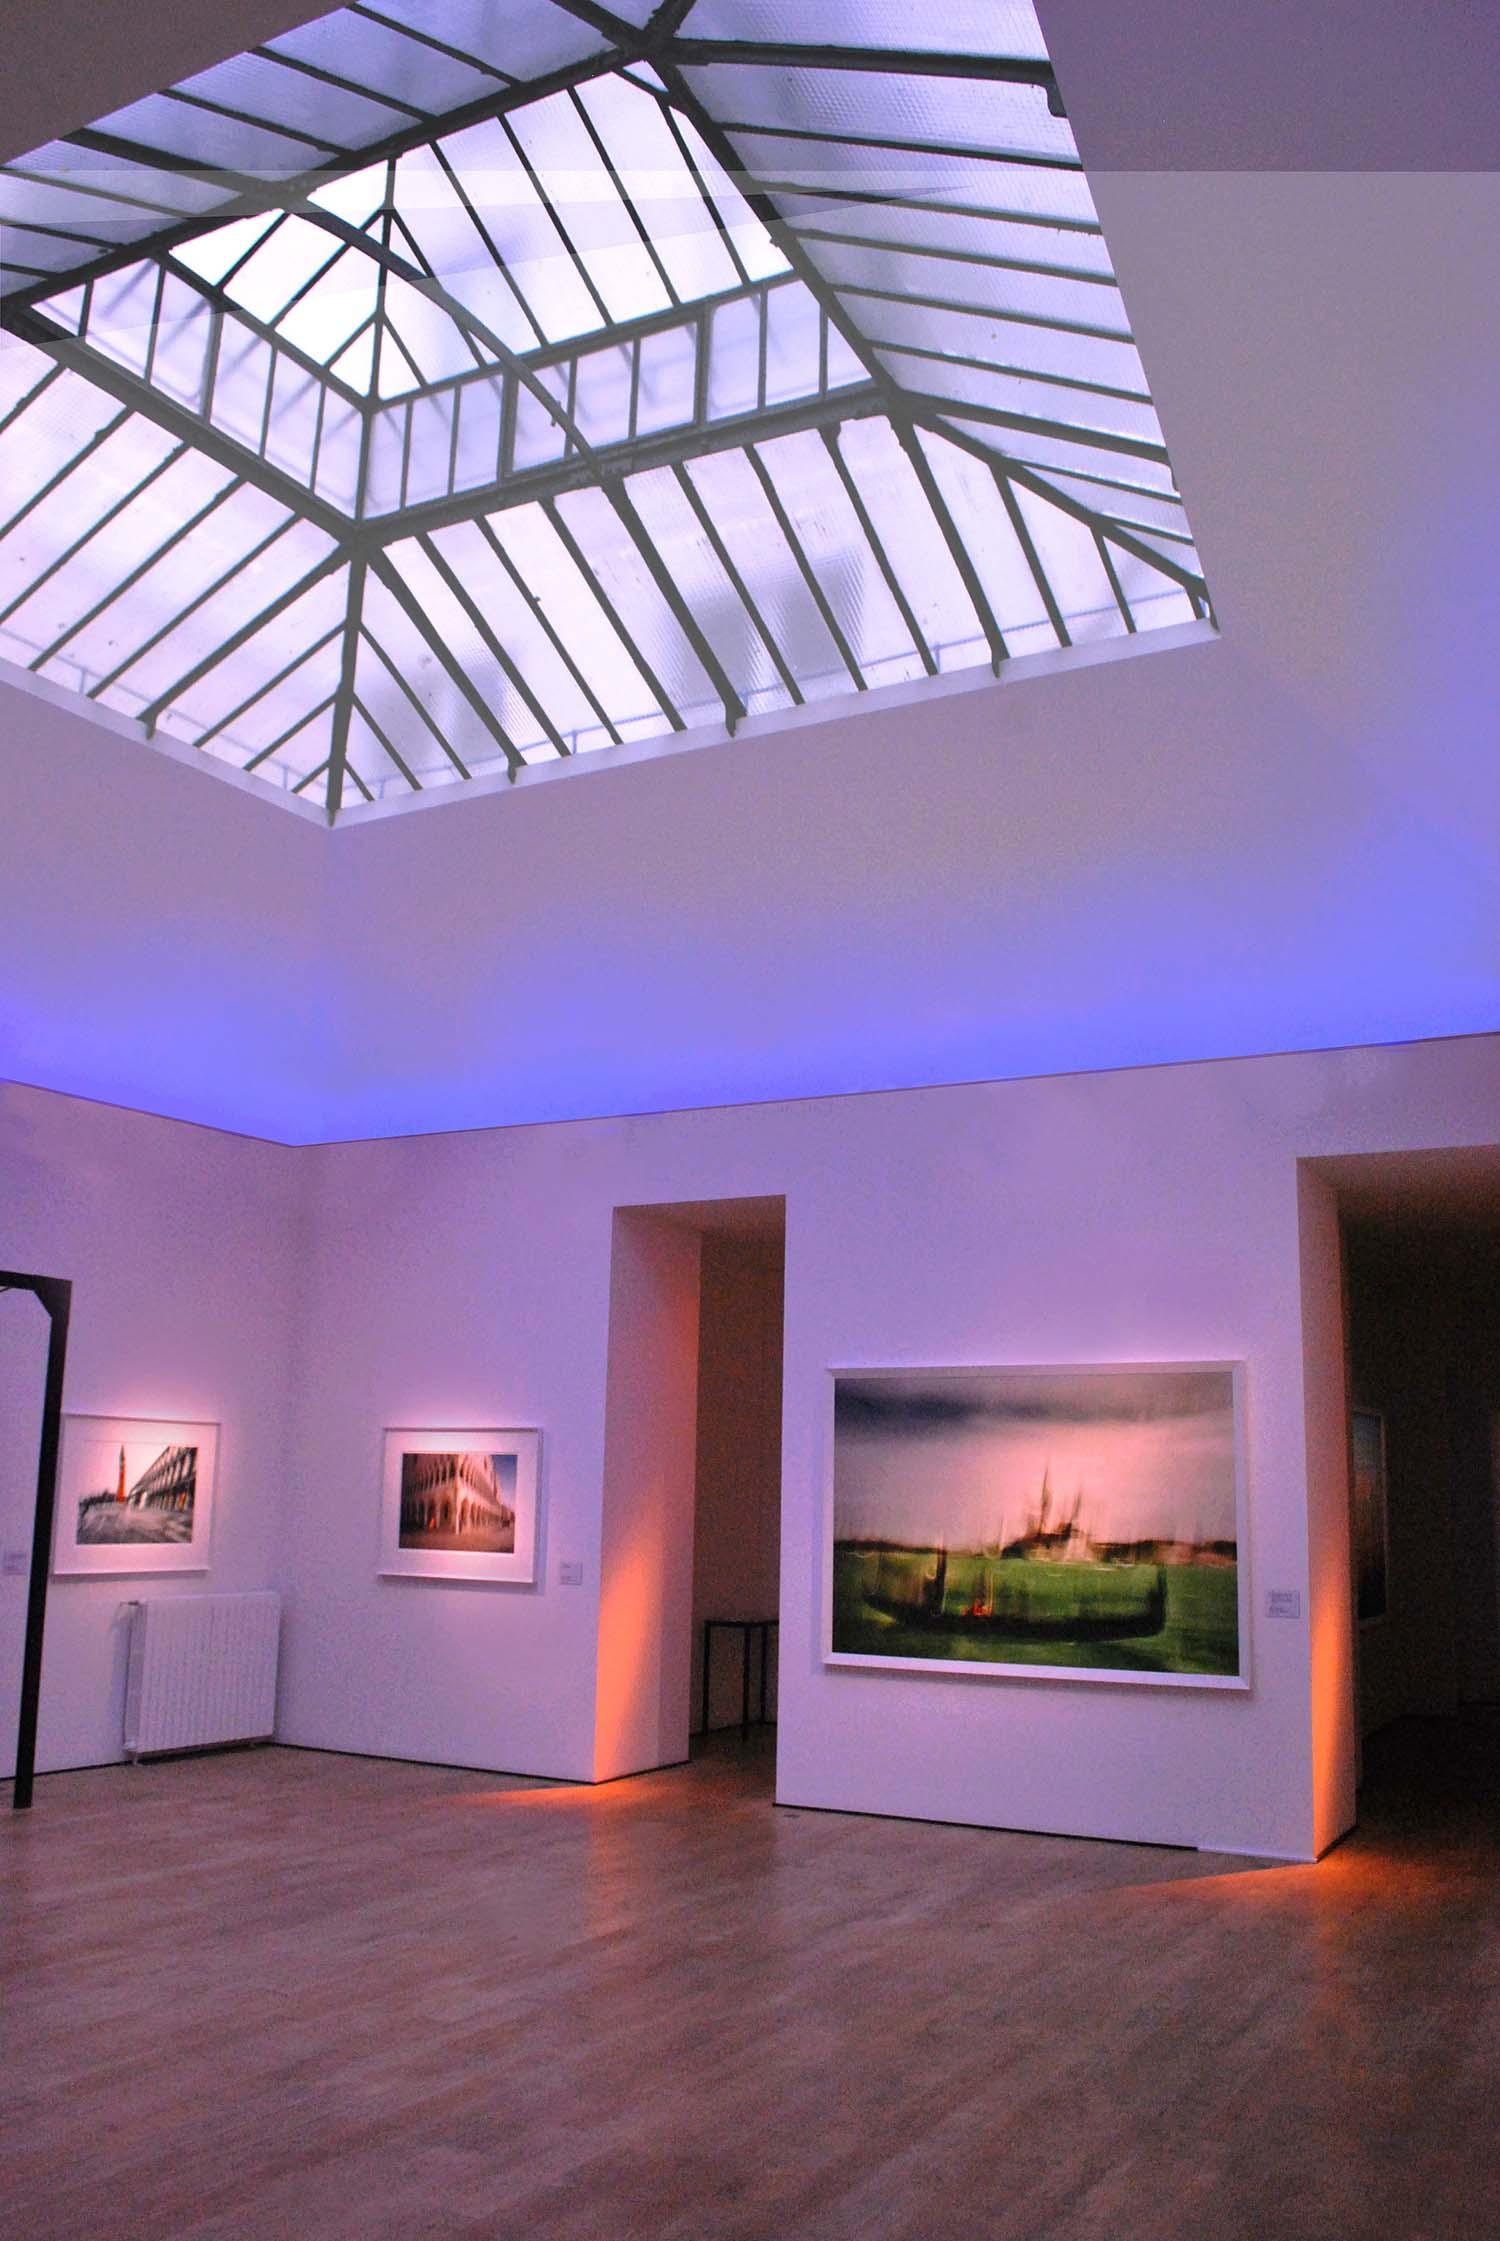 Roberto-Polillo-Galerie111-Parigi-2017